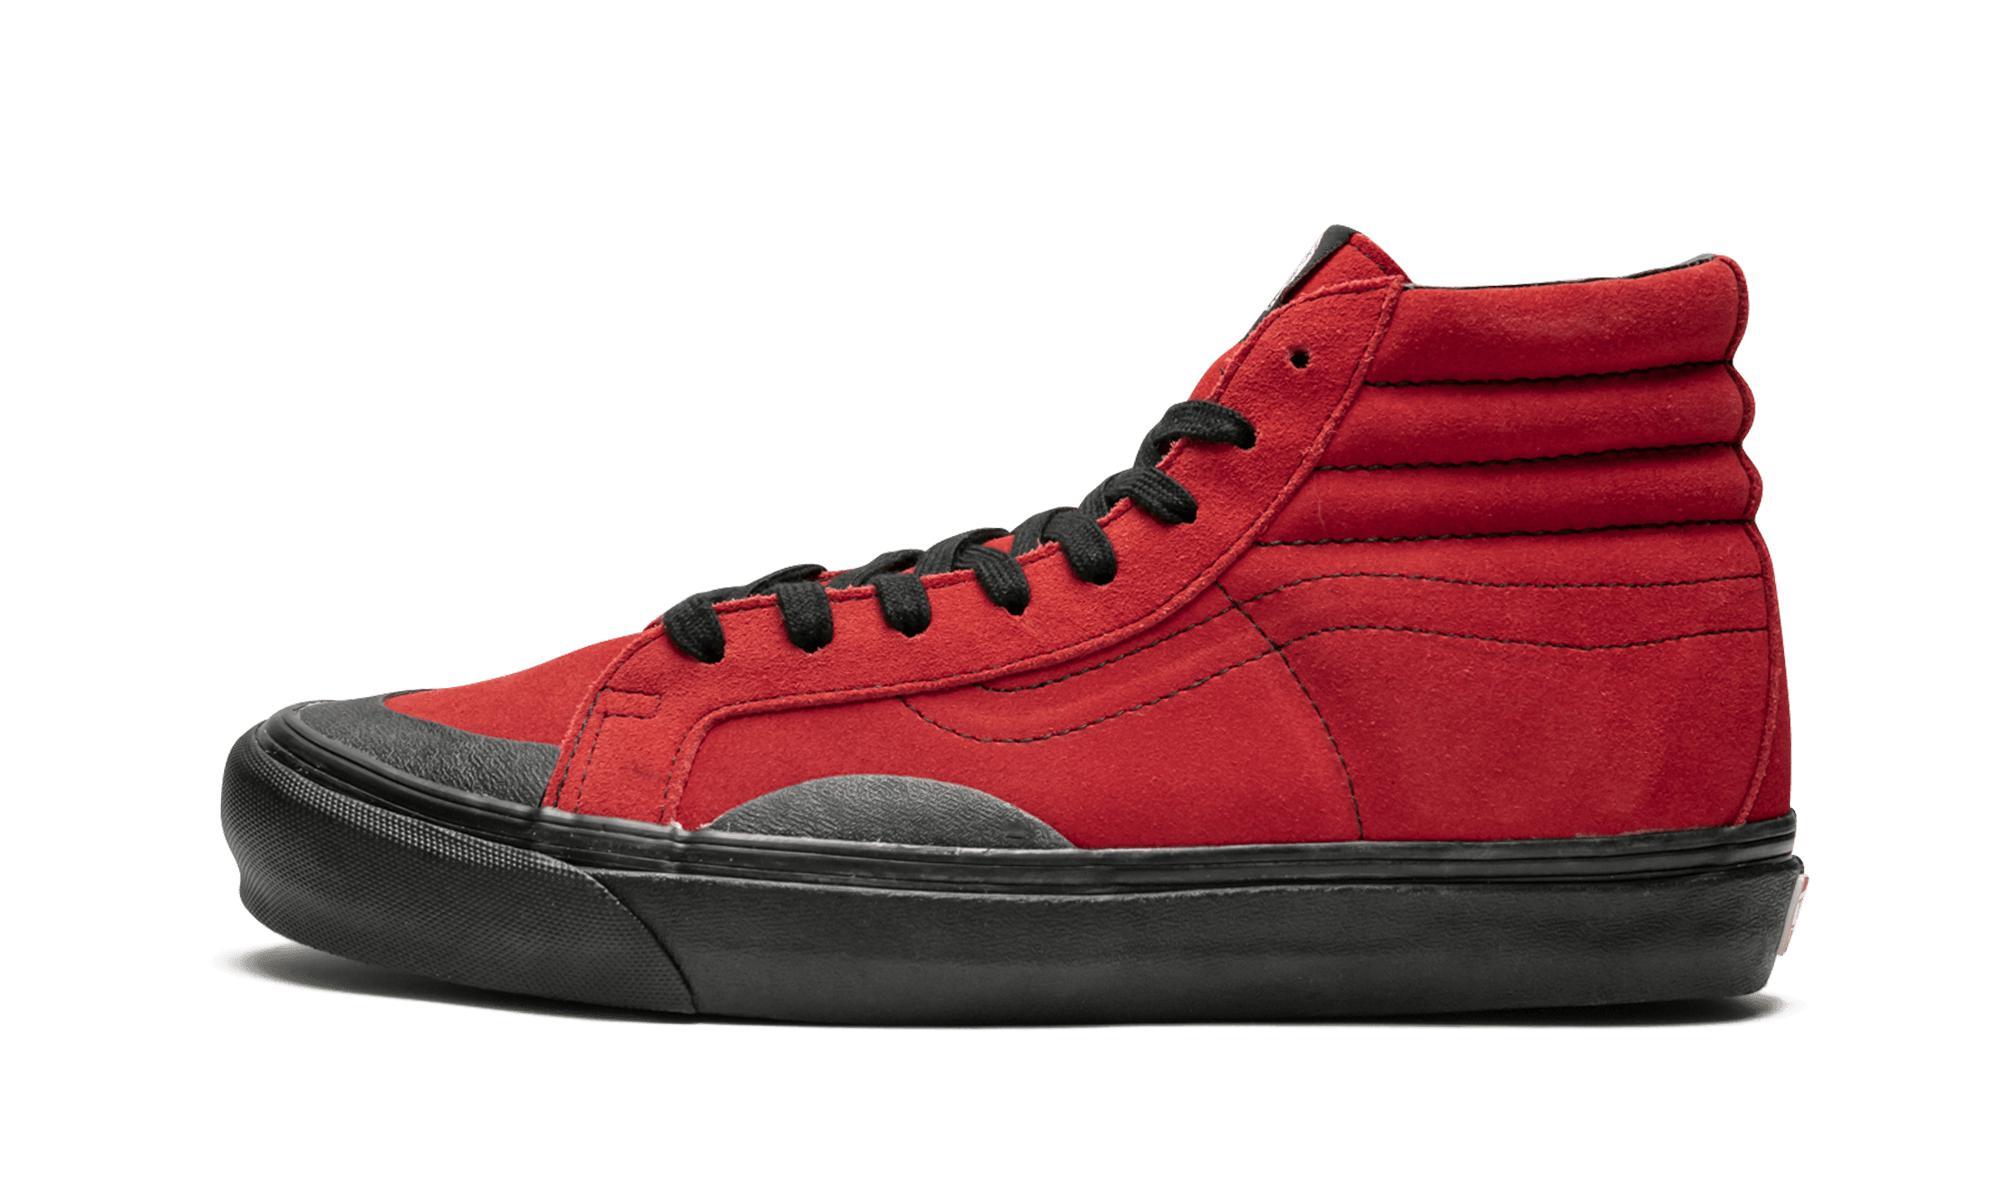 60e36213f1d762 Lyst - Vans Og Sk8-hi Lx in Red for Men